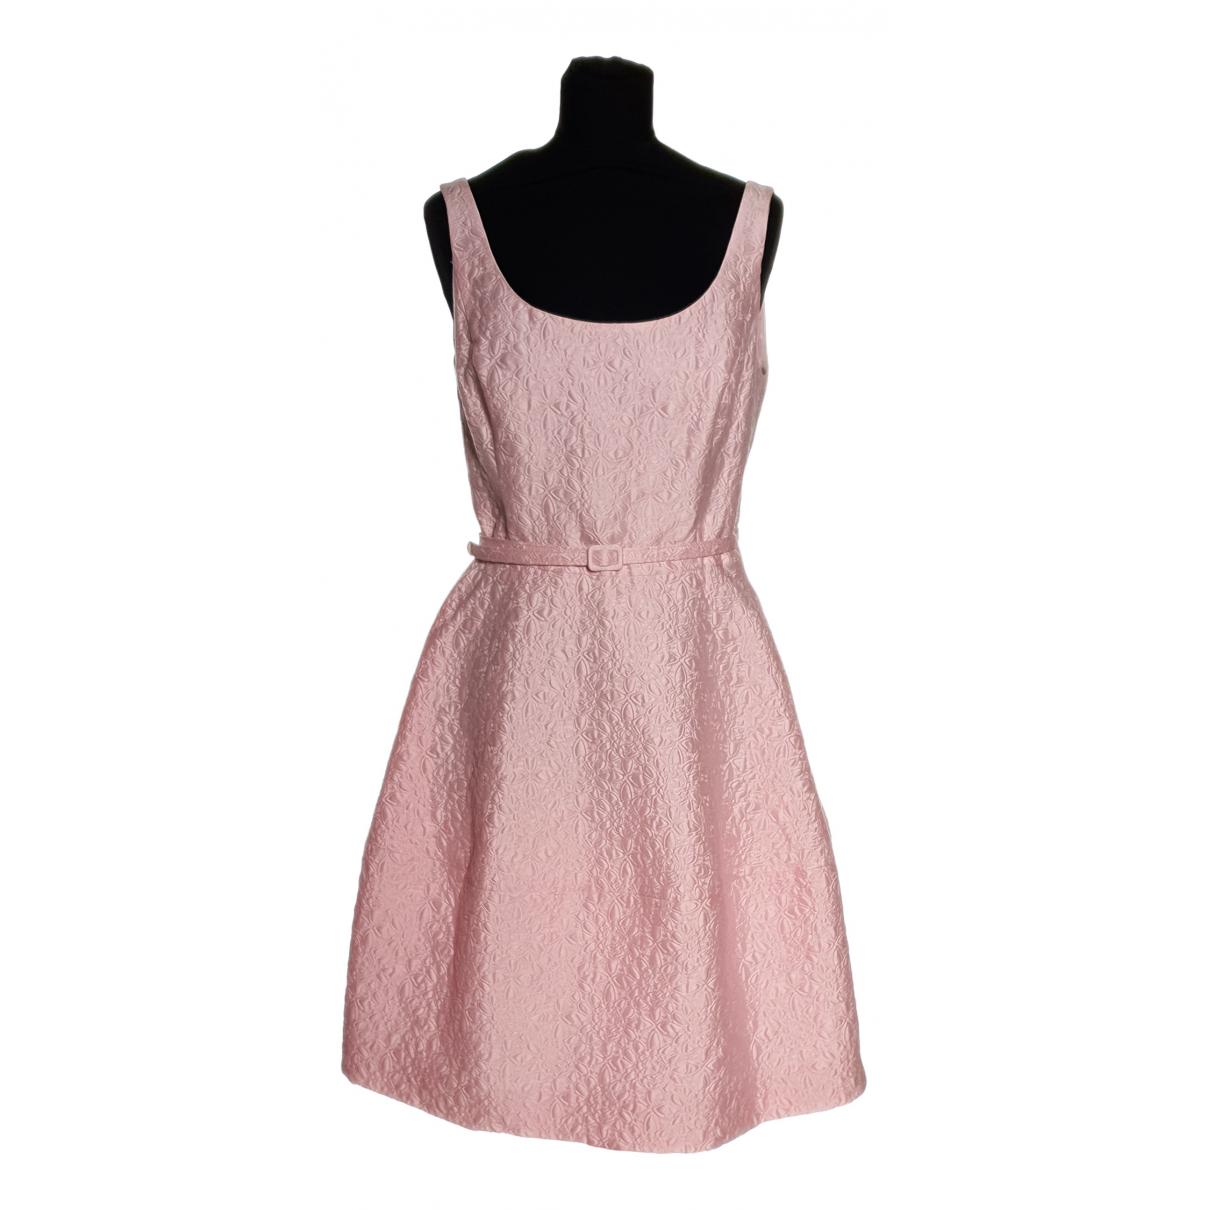 Oscar De La Renta \N Pink Cotton dress for Women 8 US